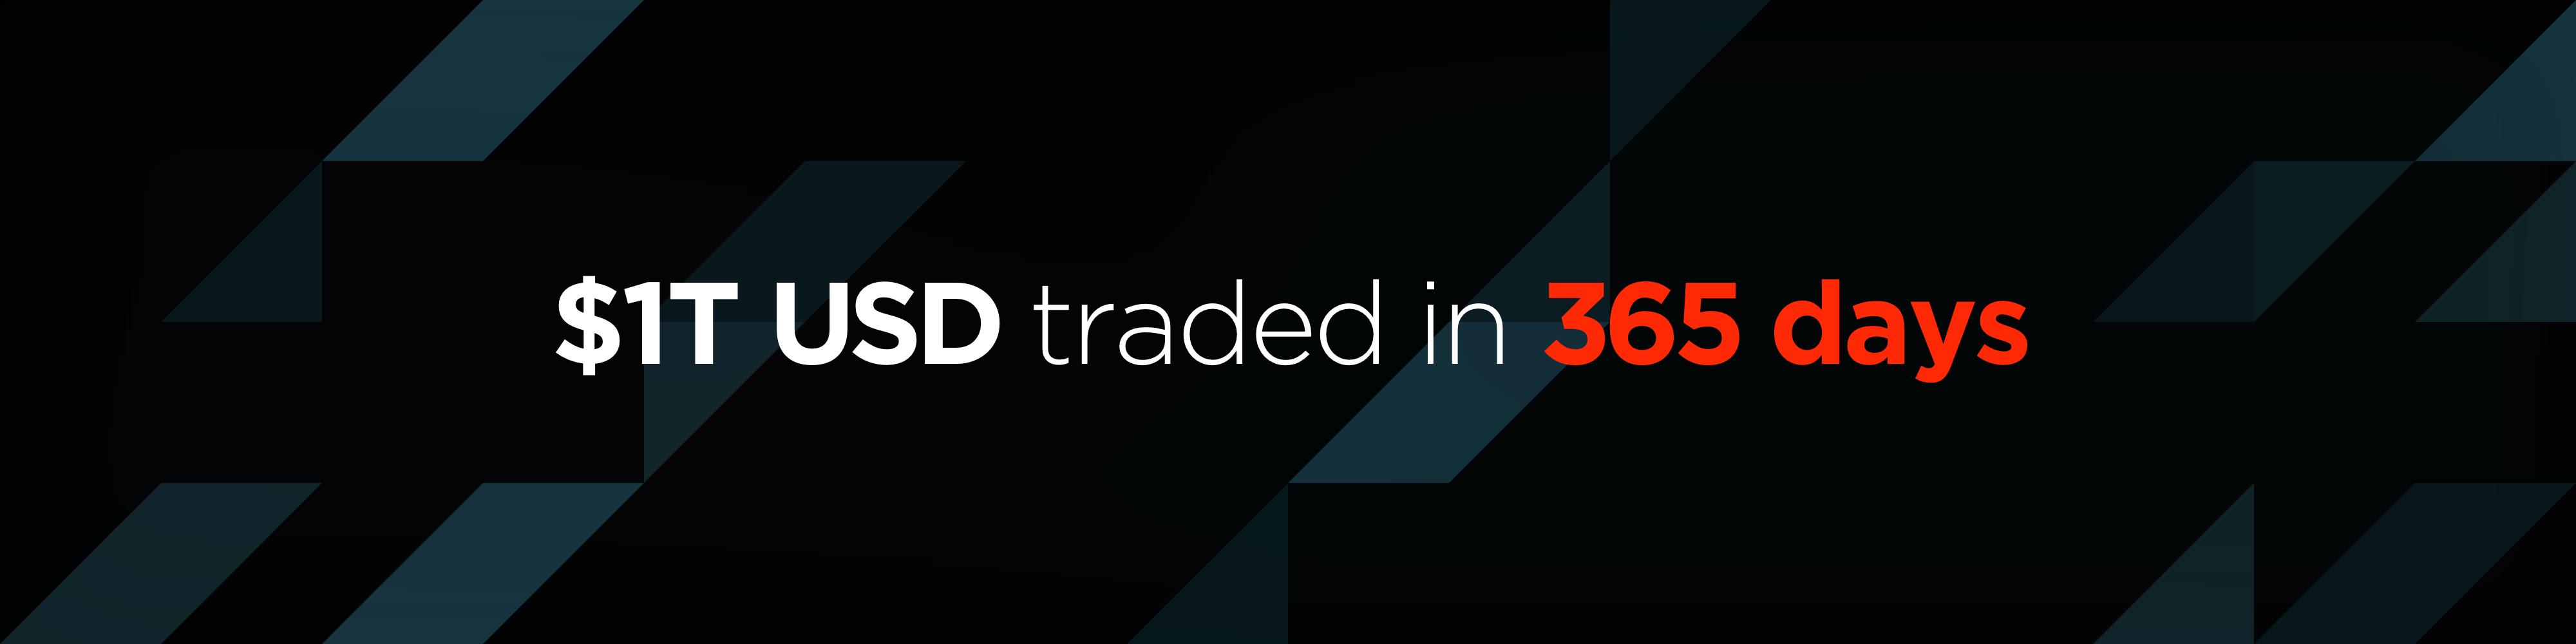 BitMEX Platform Hits US$1 Trillion in 365 Day Volume with Excellent Platform Performance